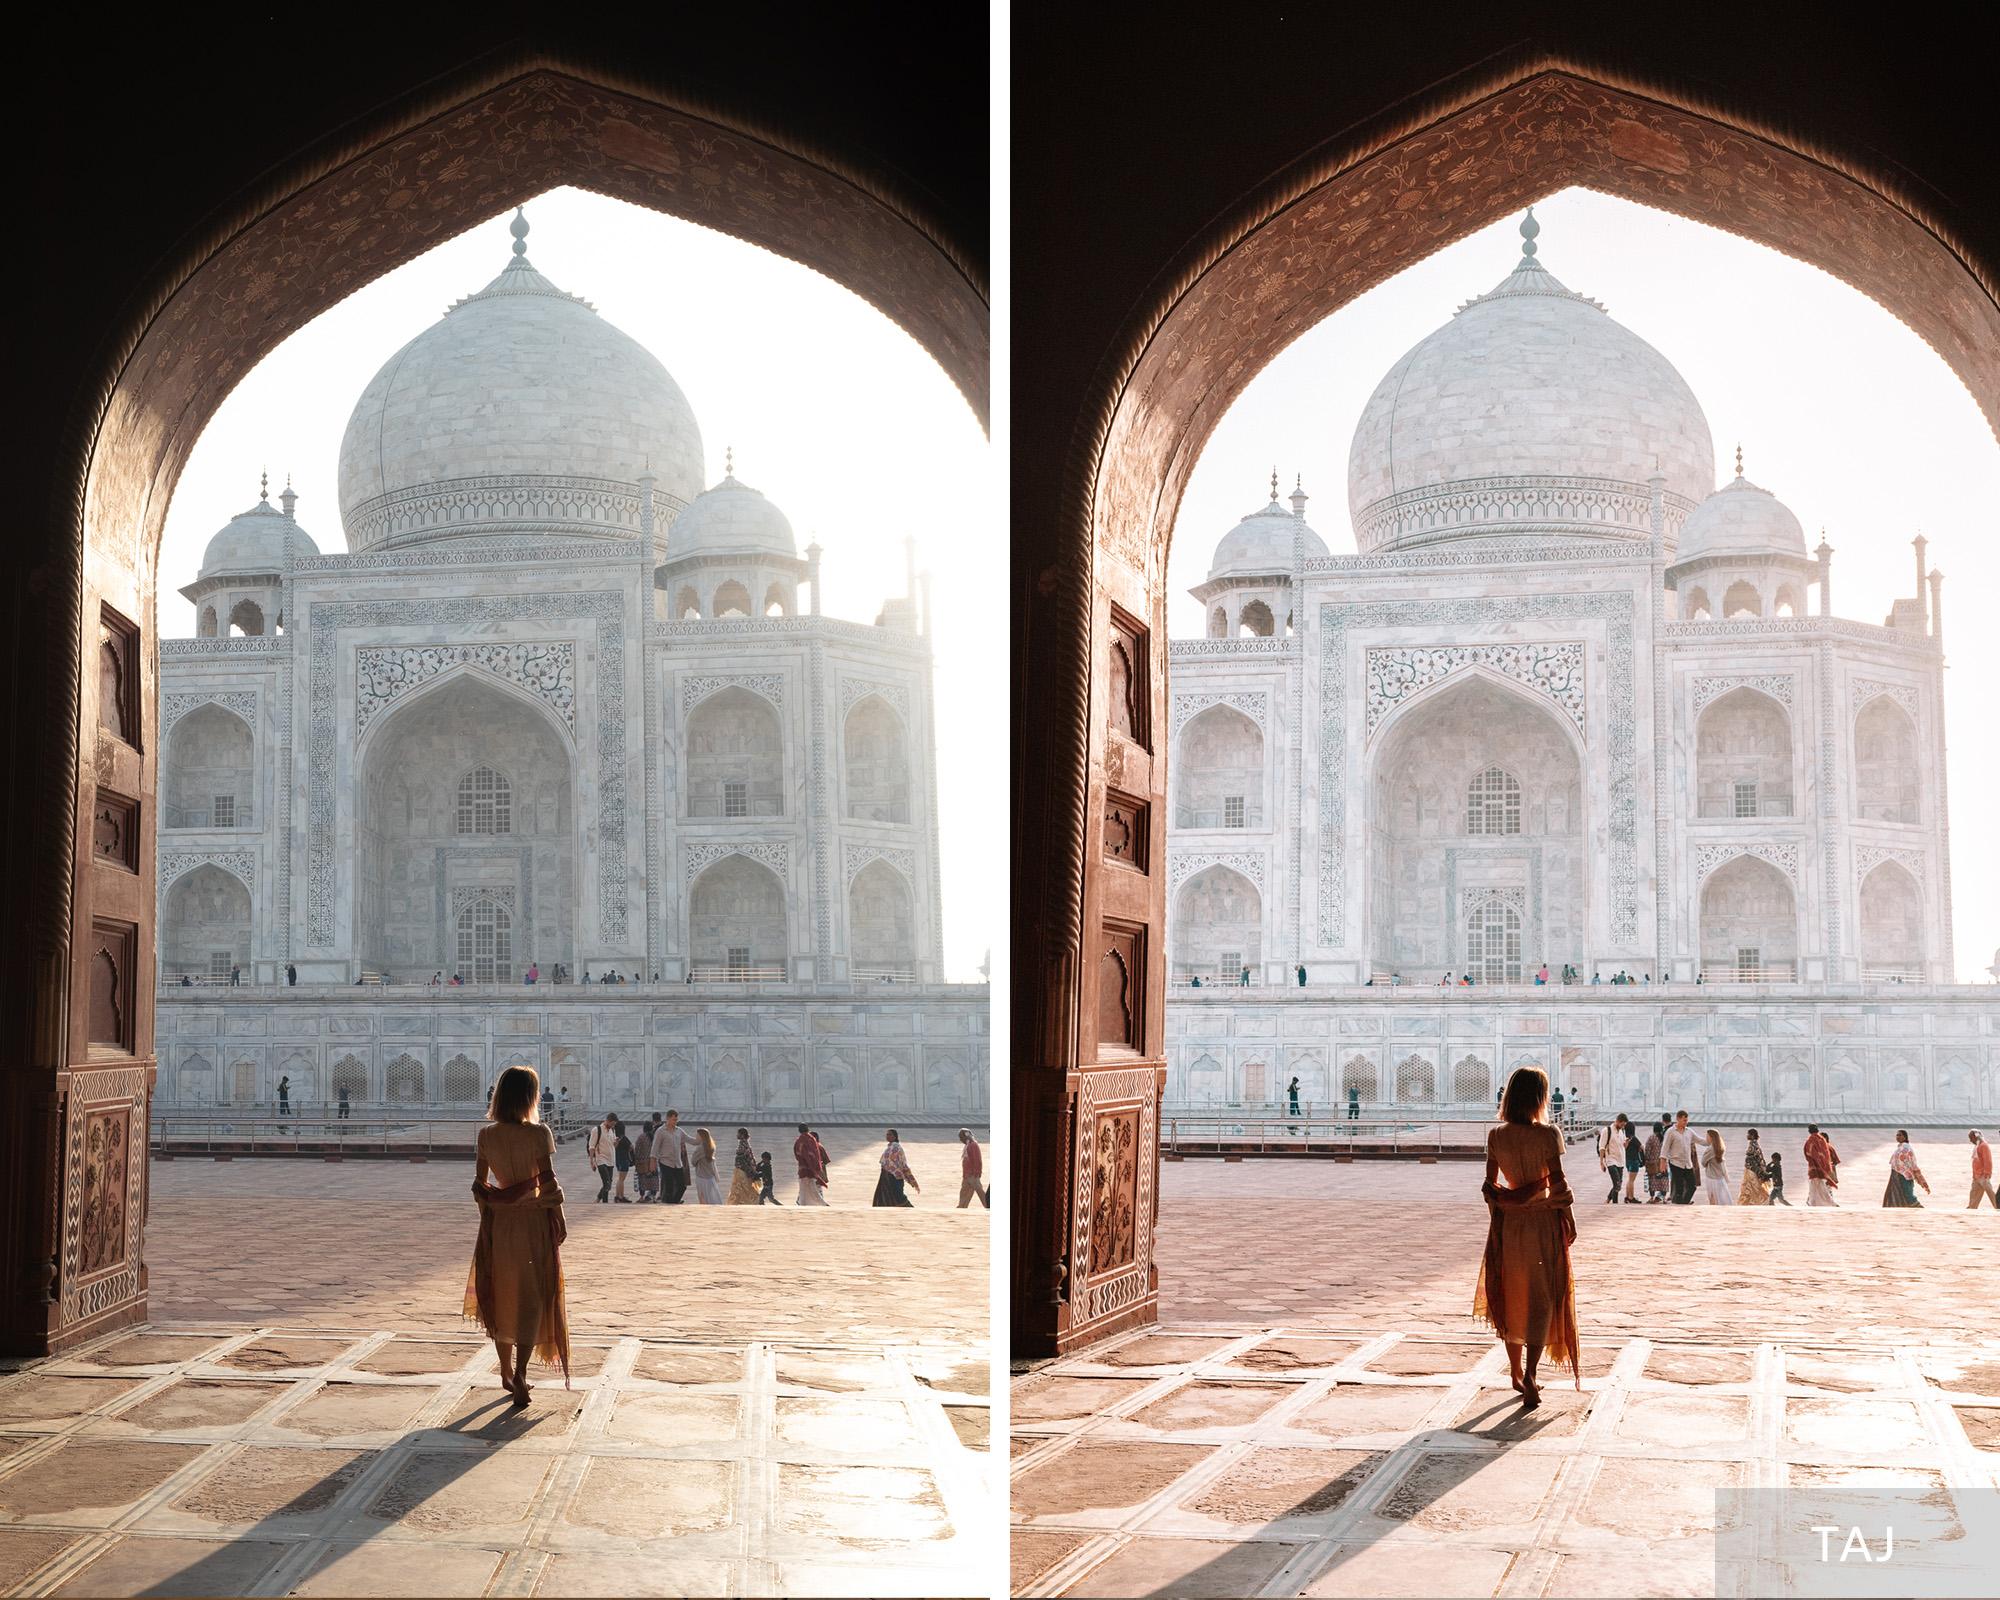 TAJ - Find Us Lost India Lightroom Desktop Preset Collection